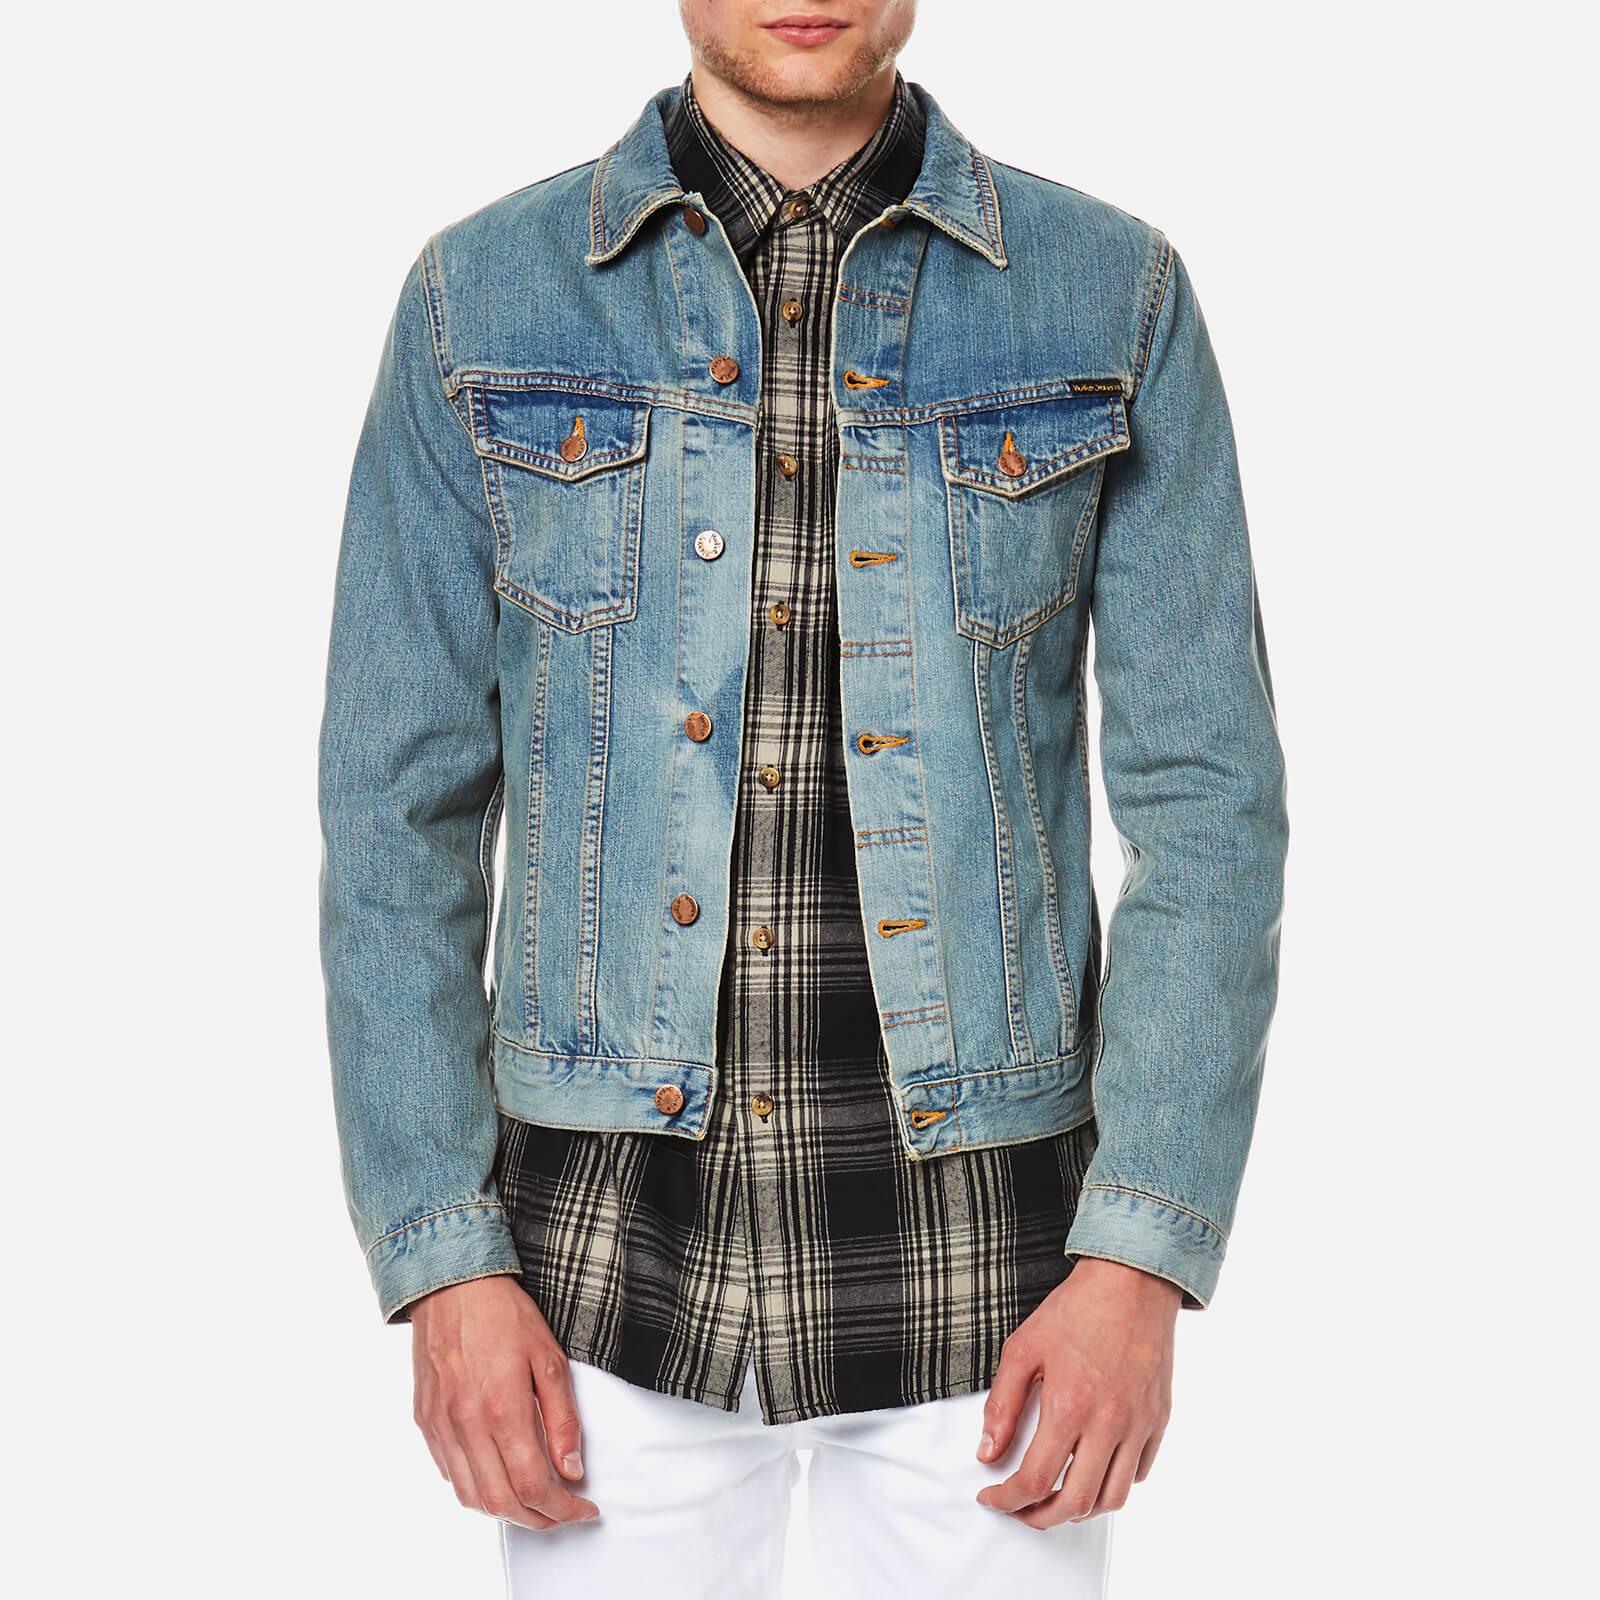 13175f359a Nudie Jeans Men s Billy Trucker Jacket - Worn Clean - Free UK ...